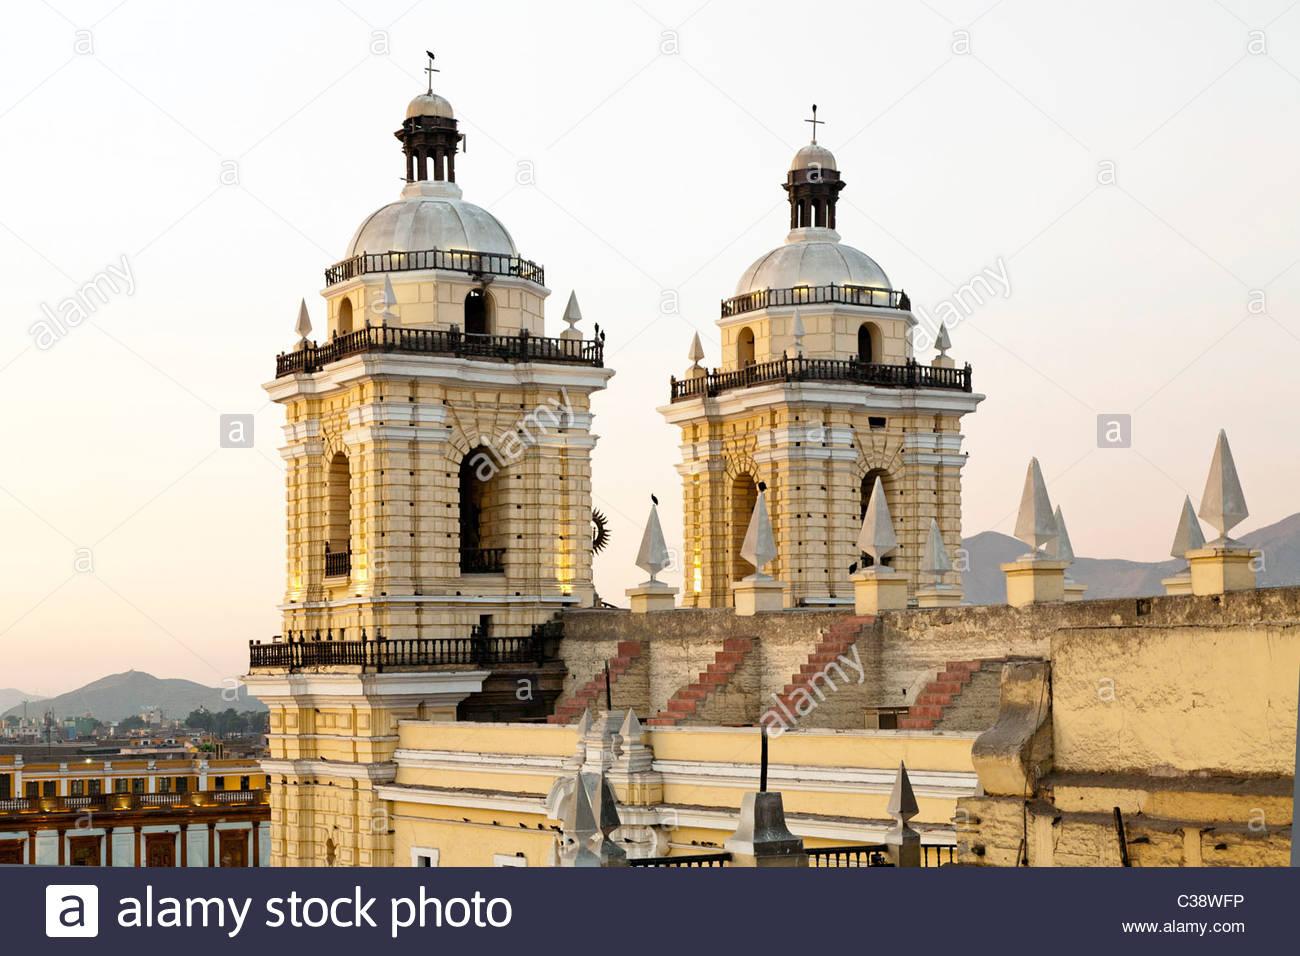 Vista posteriore della Basilica y Convento de San Francisco de Lima (San Francesco monastero) al tramonto. Lima, Immagini Stock